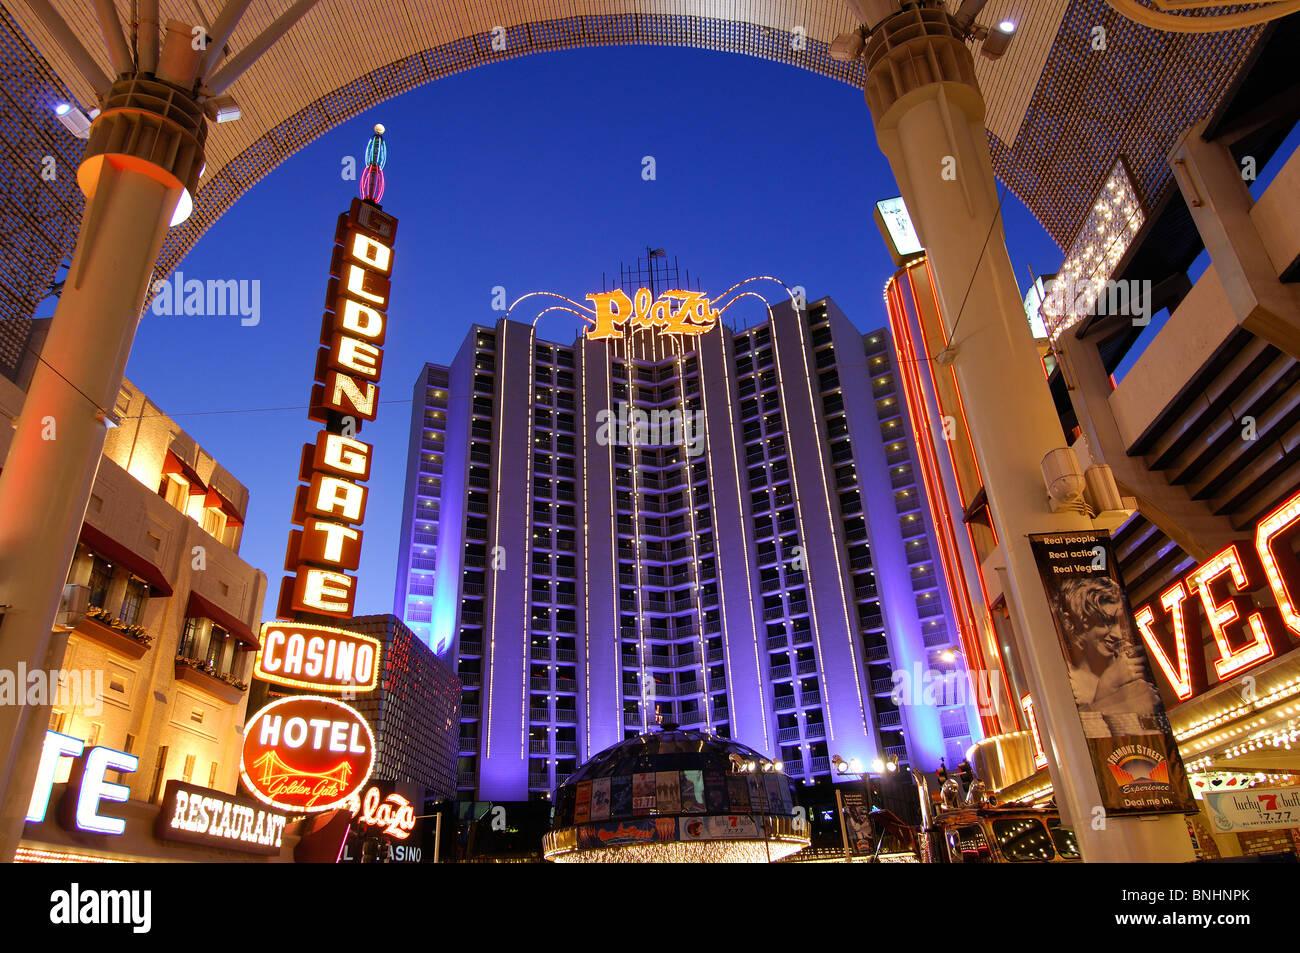 plaza hotel casino las vegas